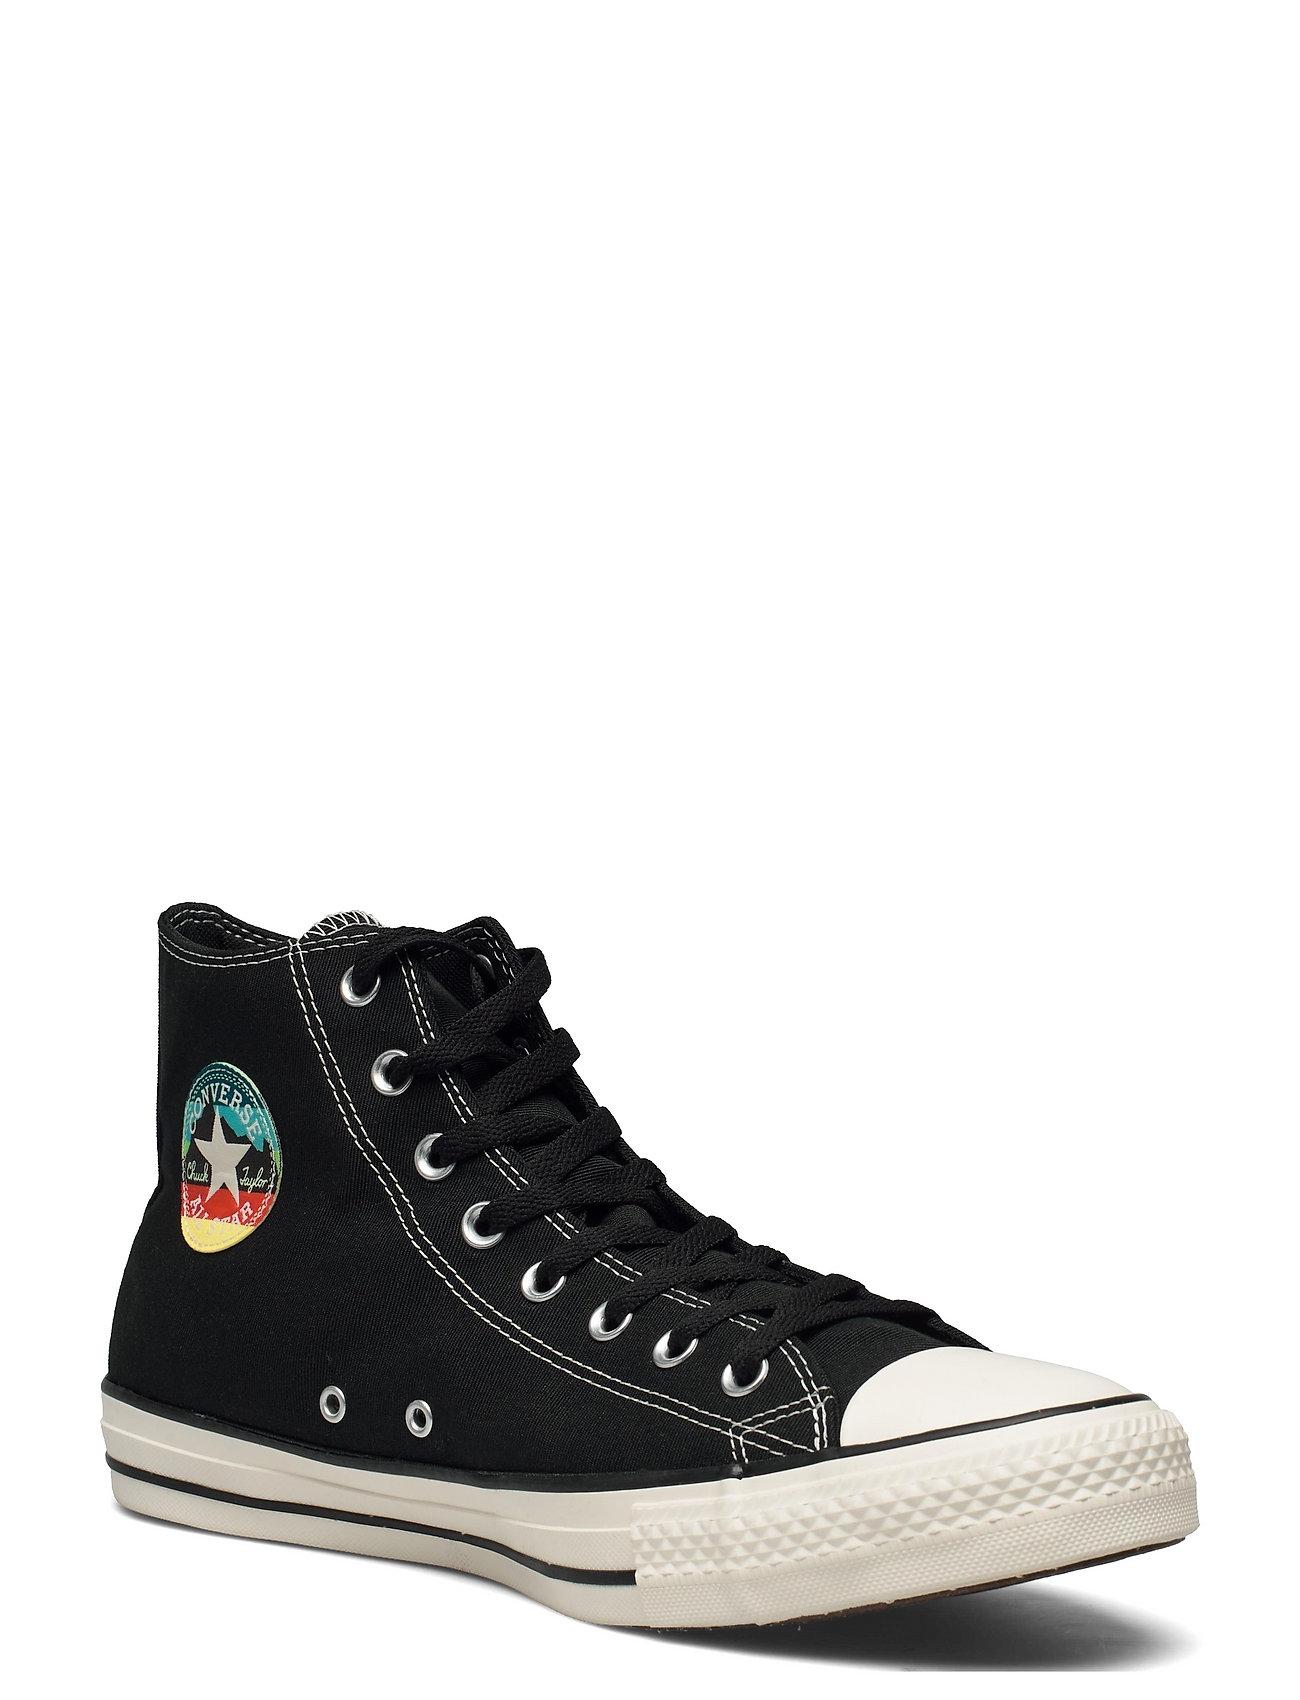 Image of Ctas Hi Black/Egret/Black High-top Sneakers Sort Converse (3534657737)